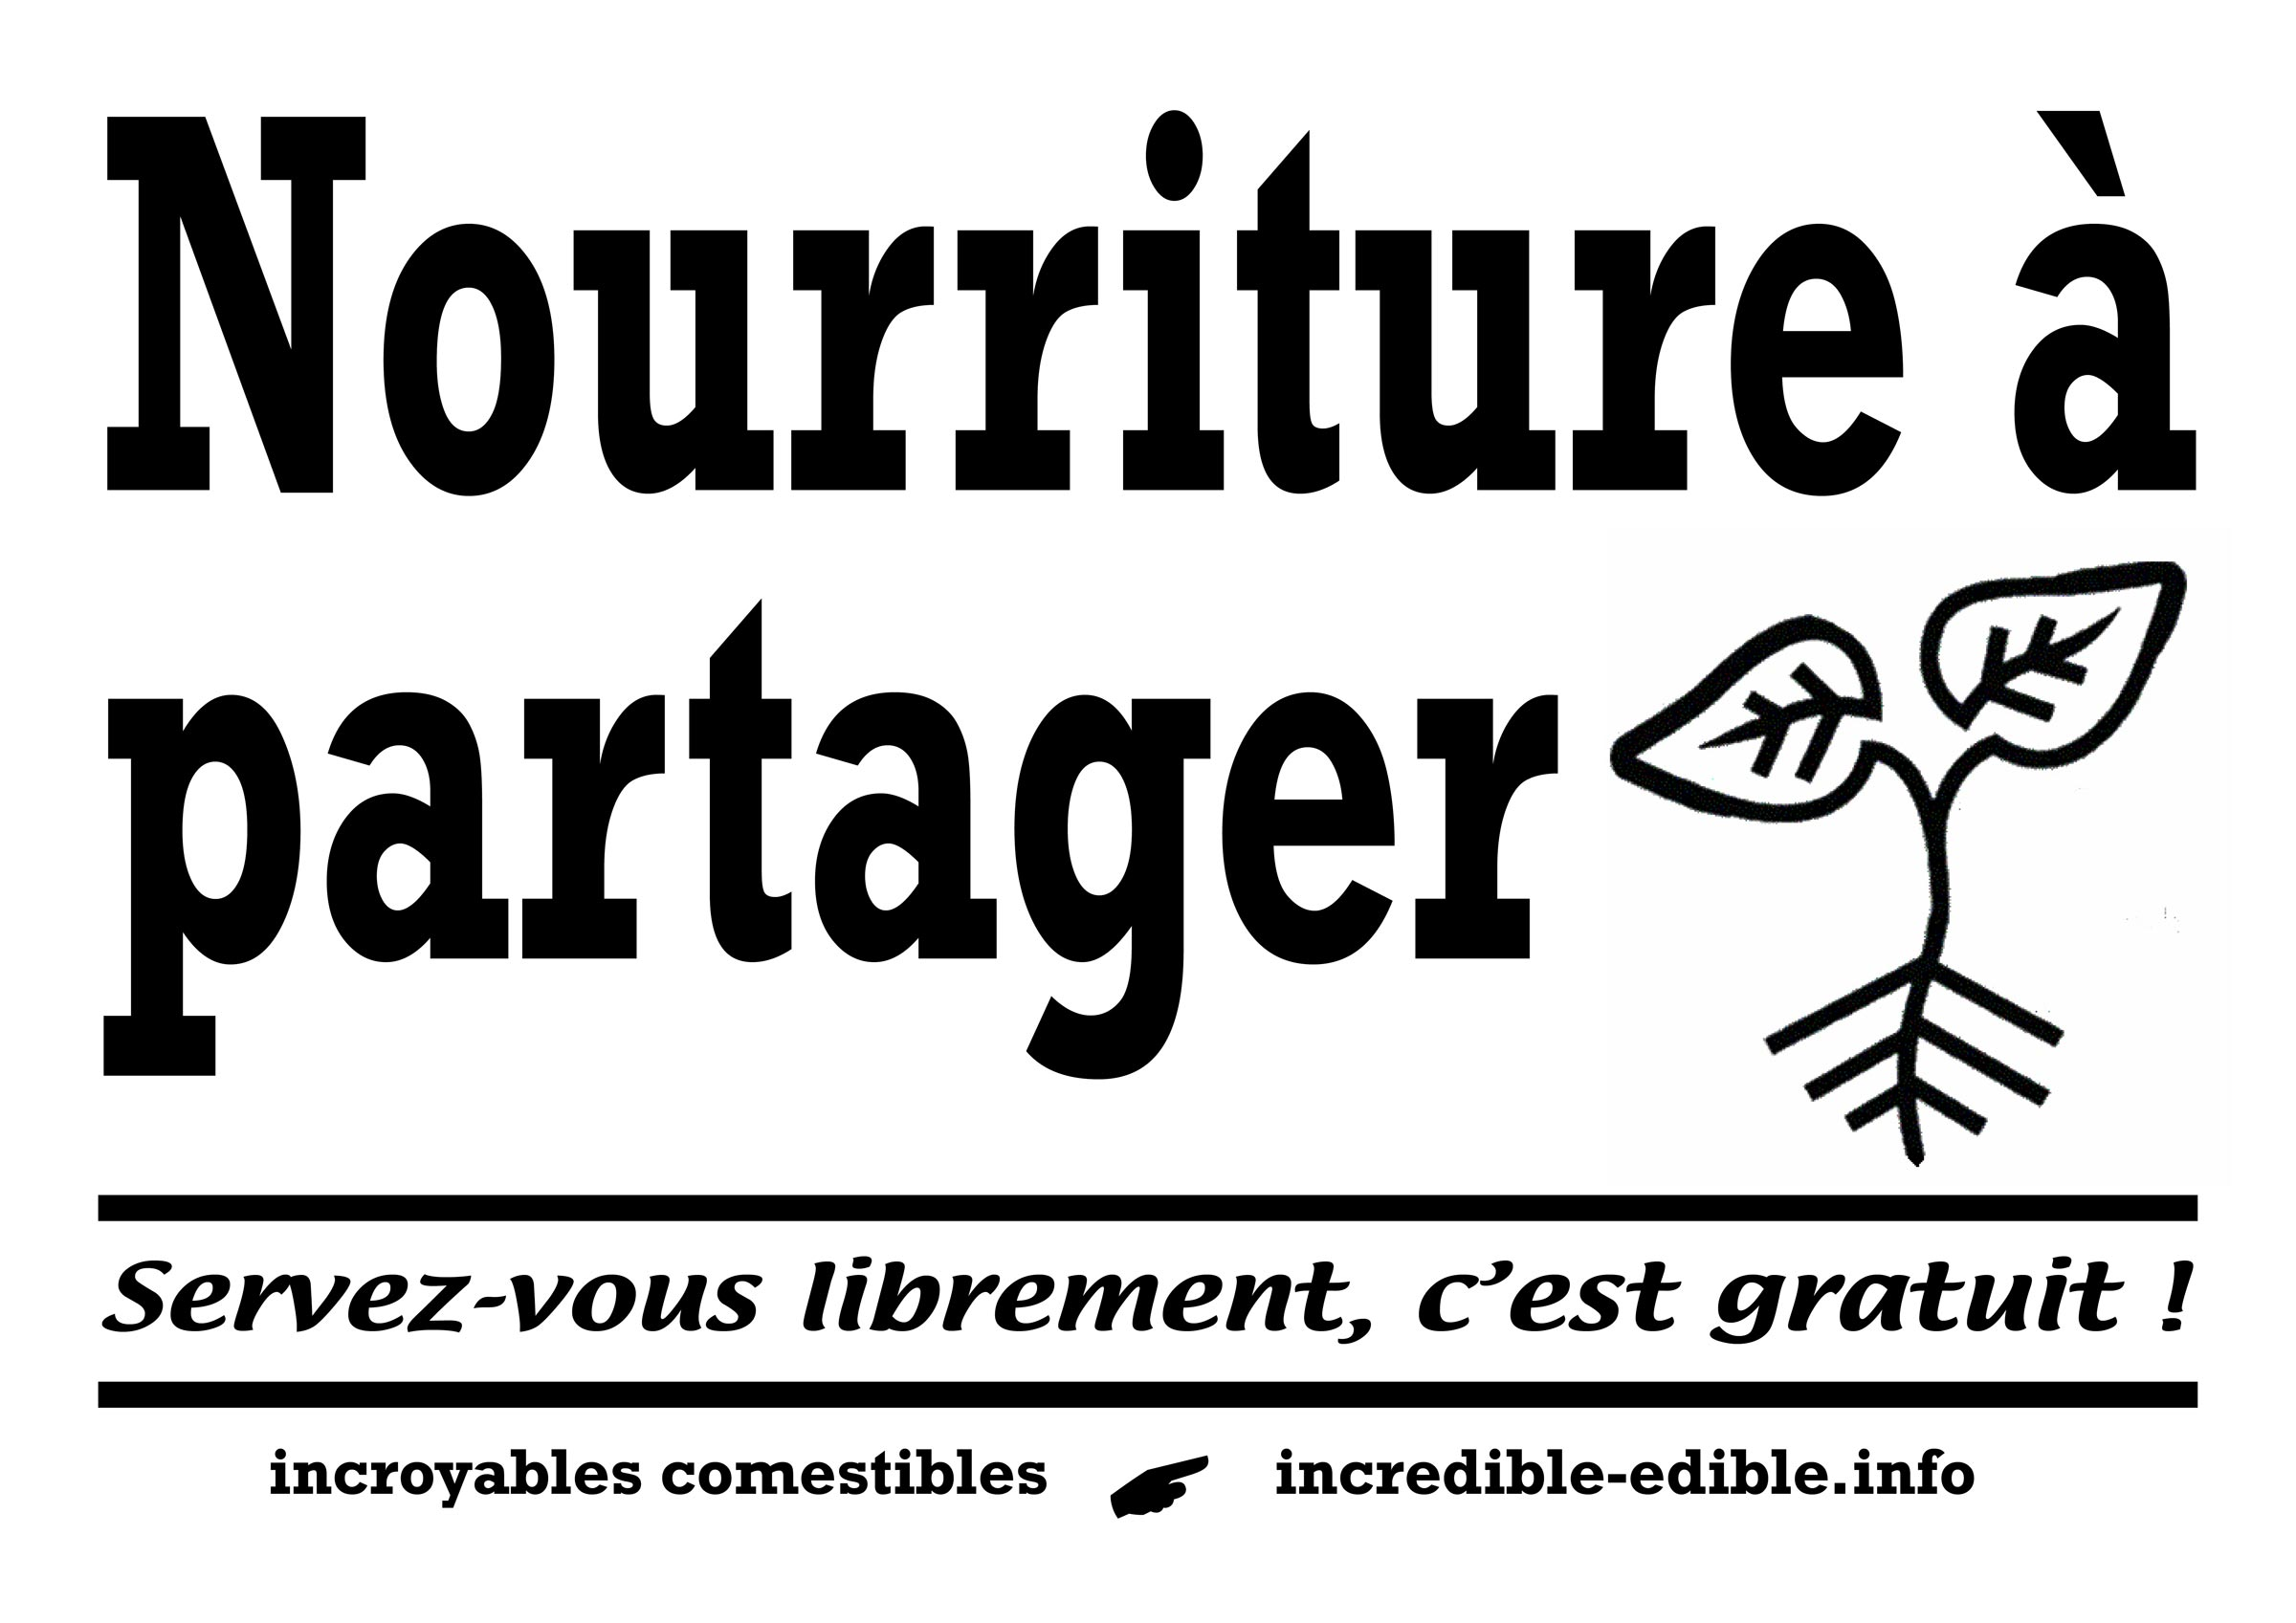 a091_incredible_edible_todmorden_france_visuel_nourriture_a_partager_incroyables_comestibles_a4_w2400